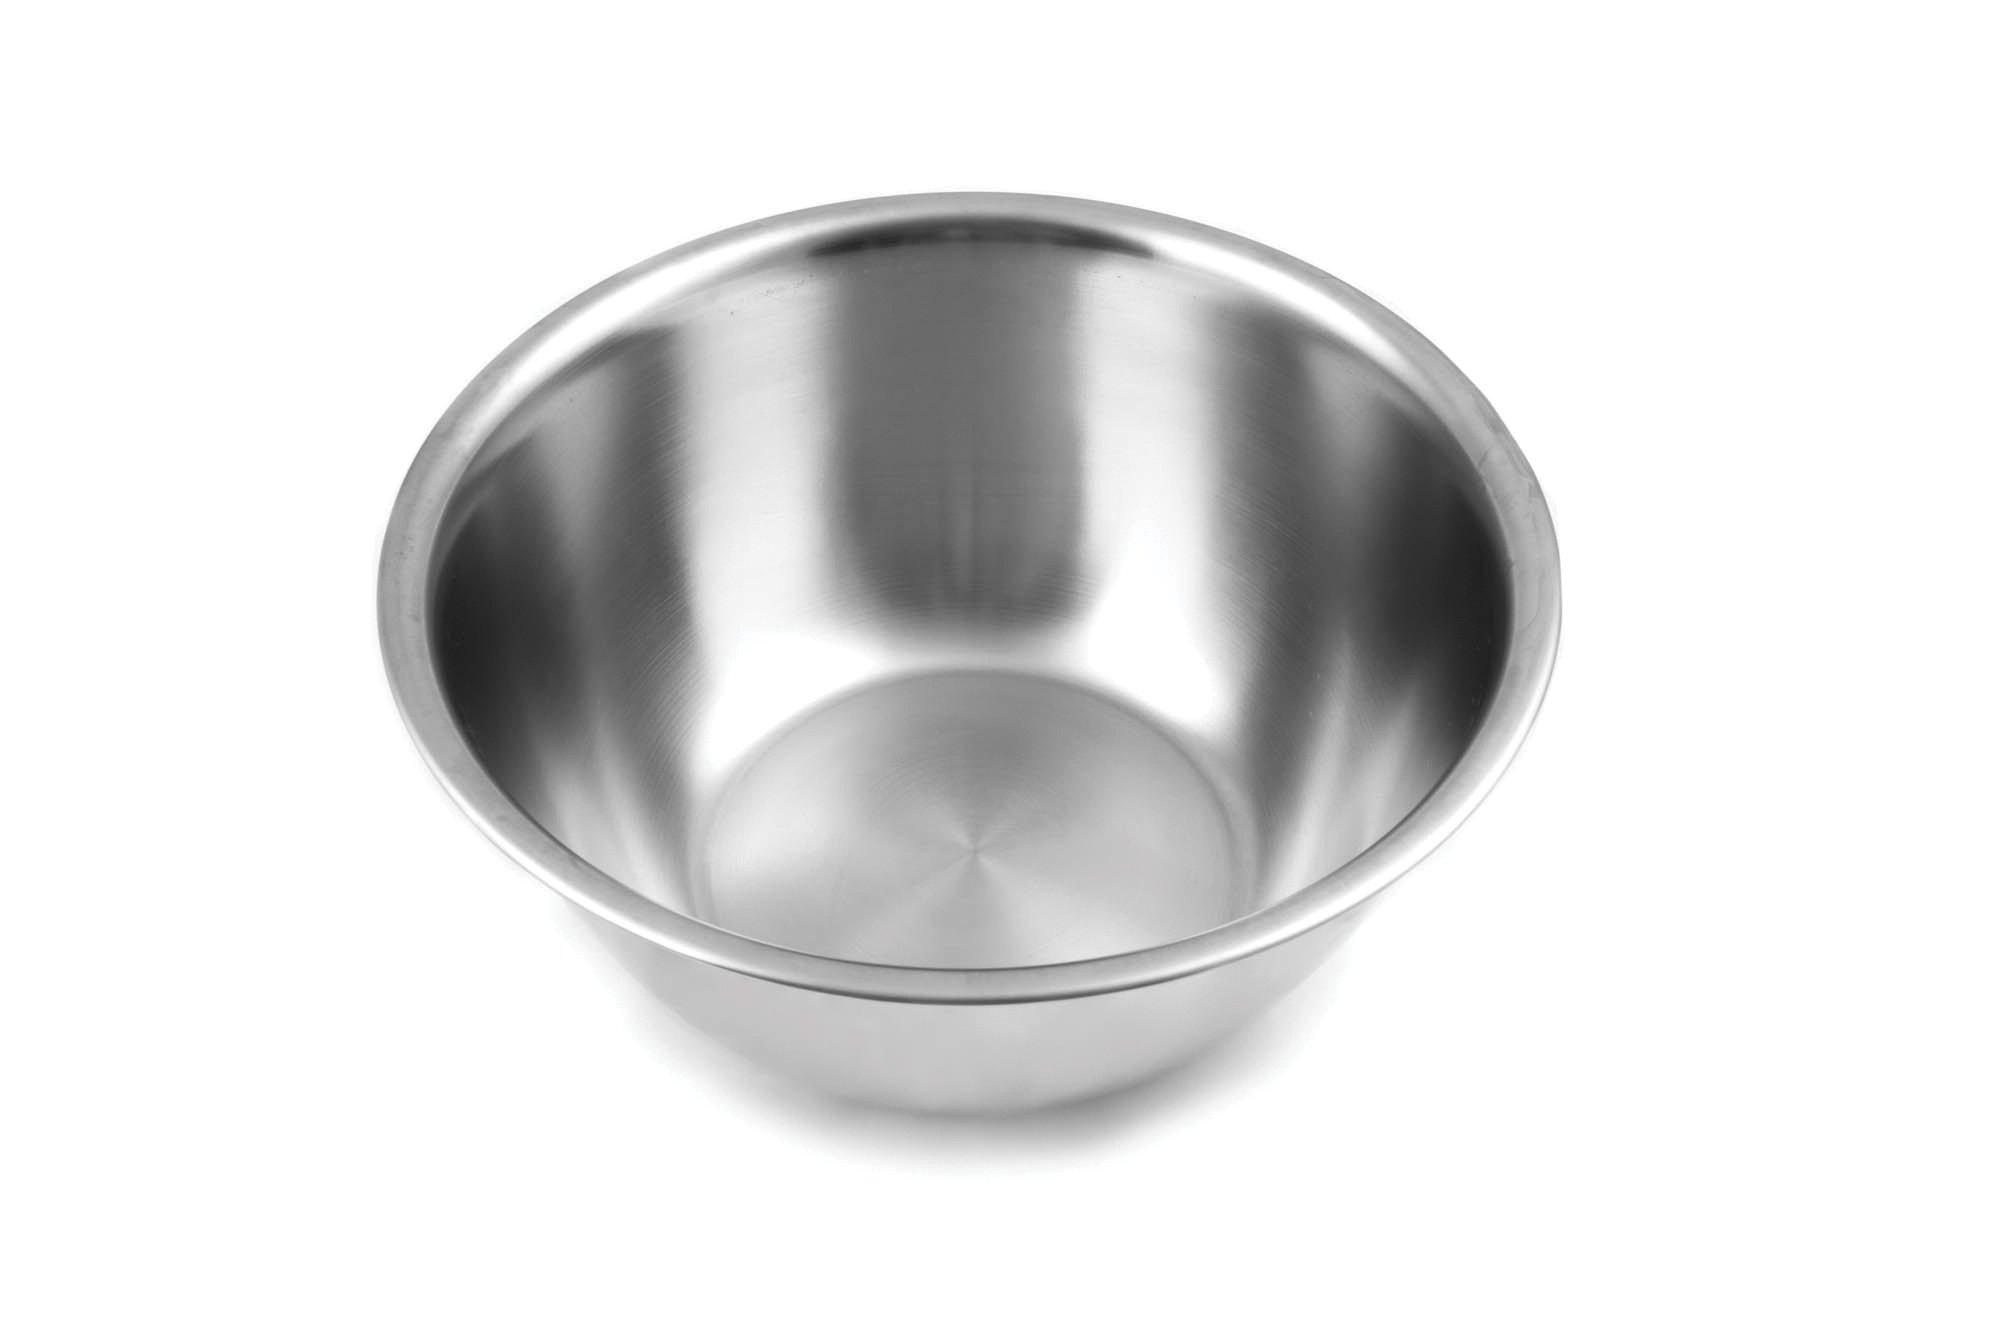 Fox Run 5-Quart Stainless Steel Mixing Bowl by Fox Run (Image #1)